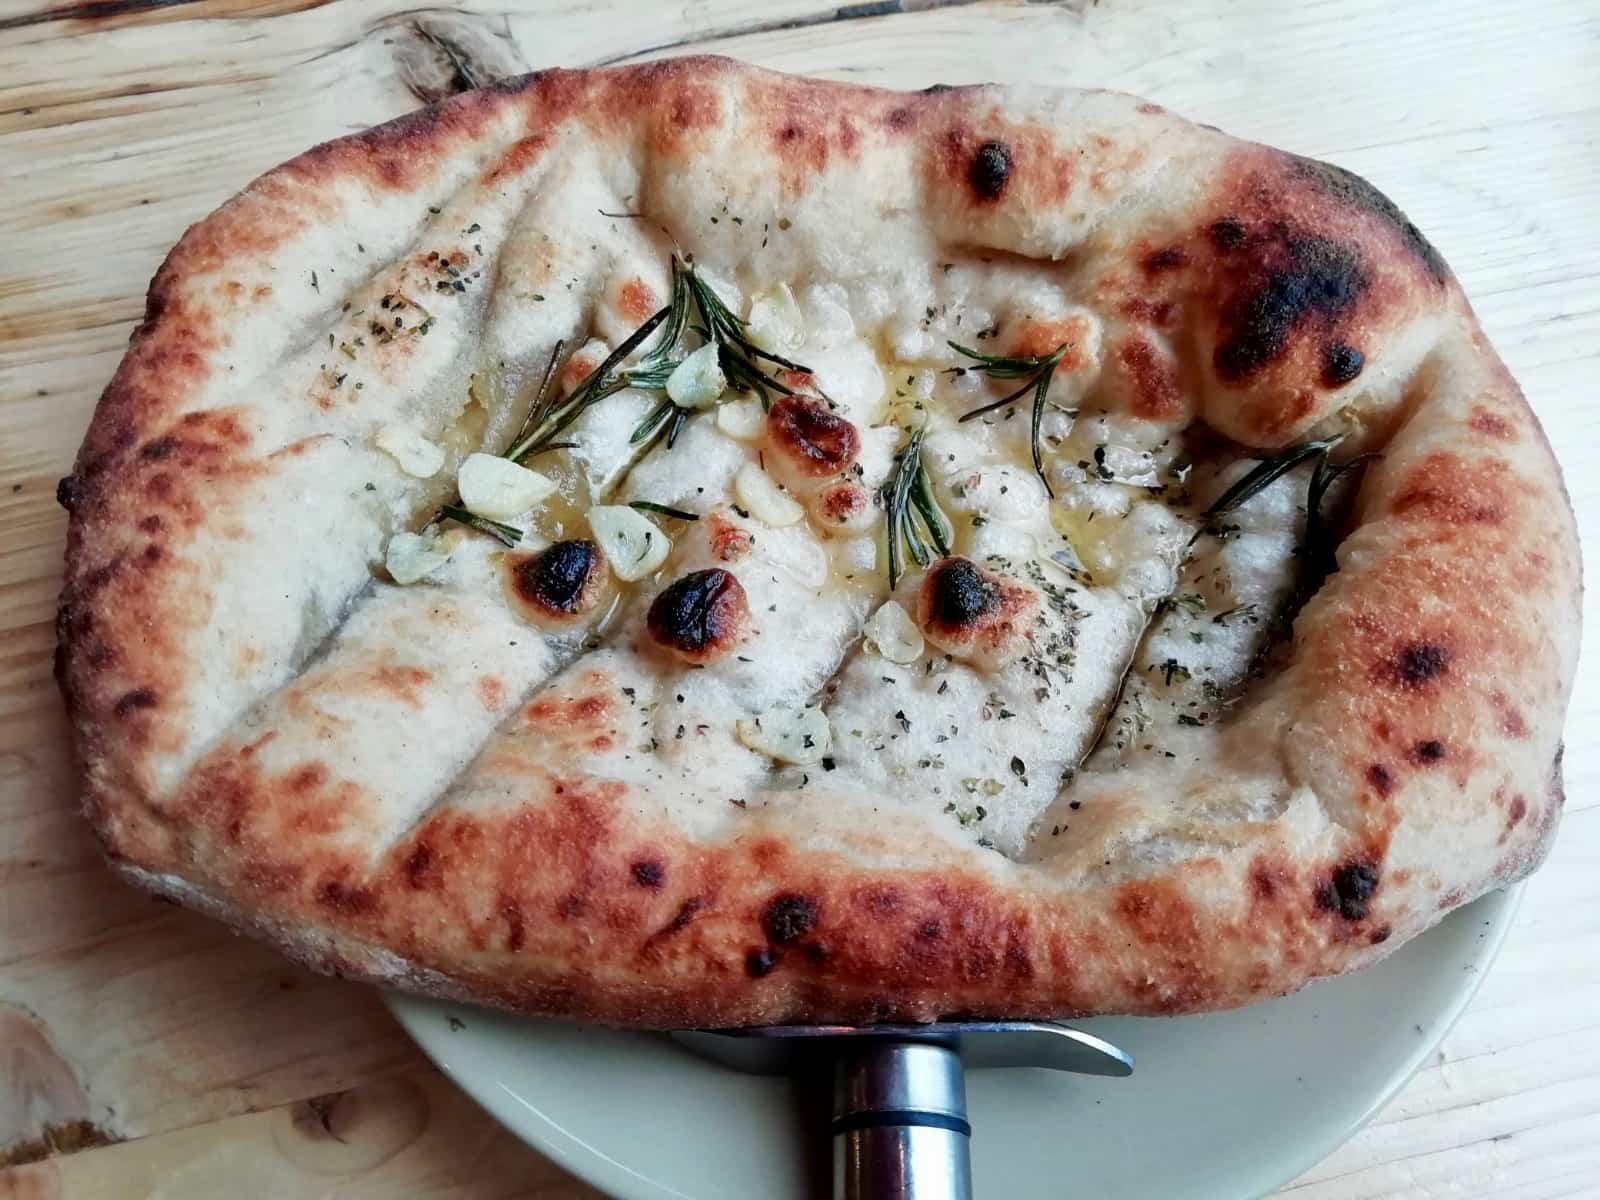 Vegan garlic bread with rosemary from Purezza, Brighton